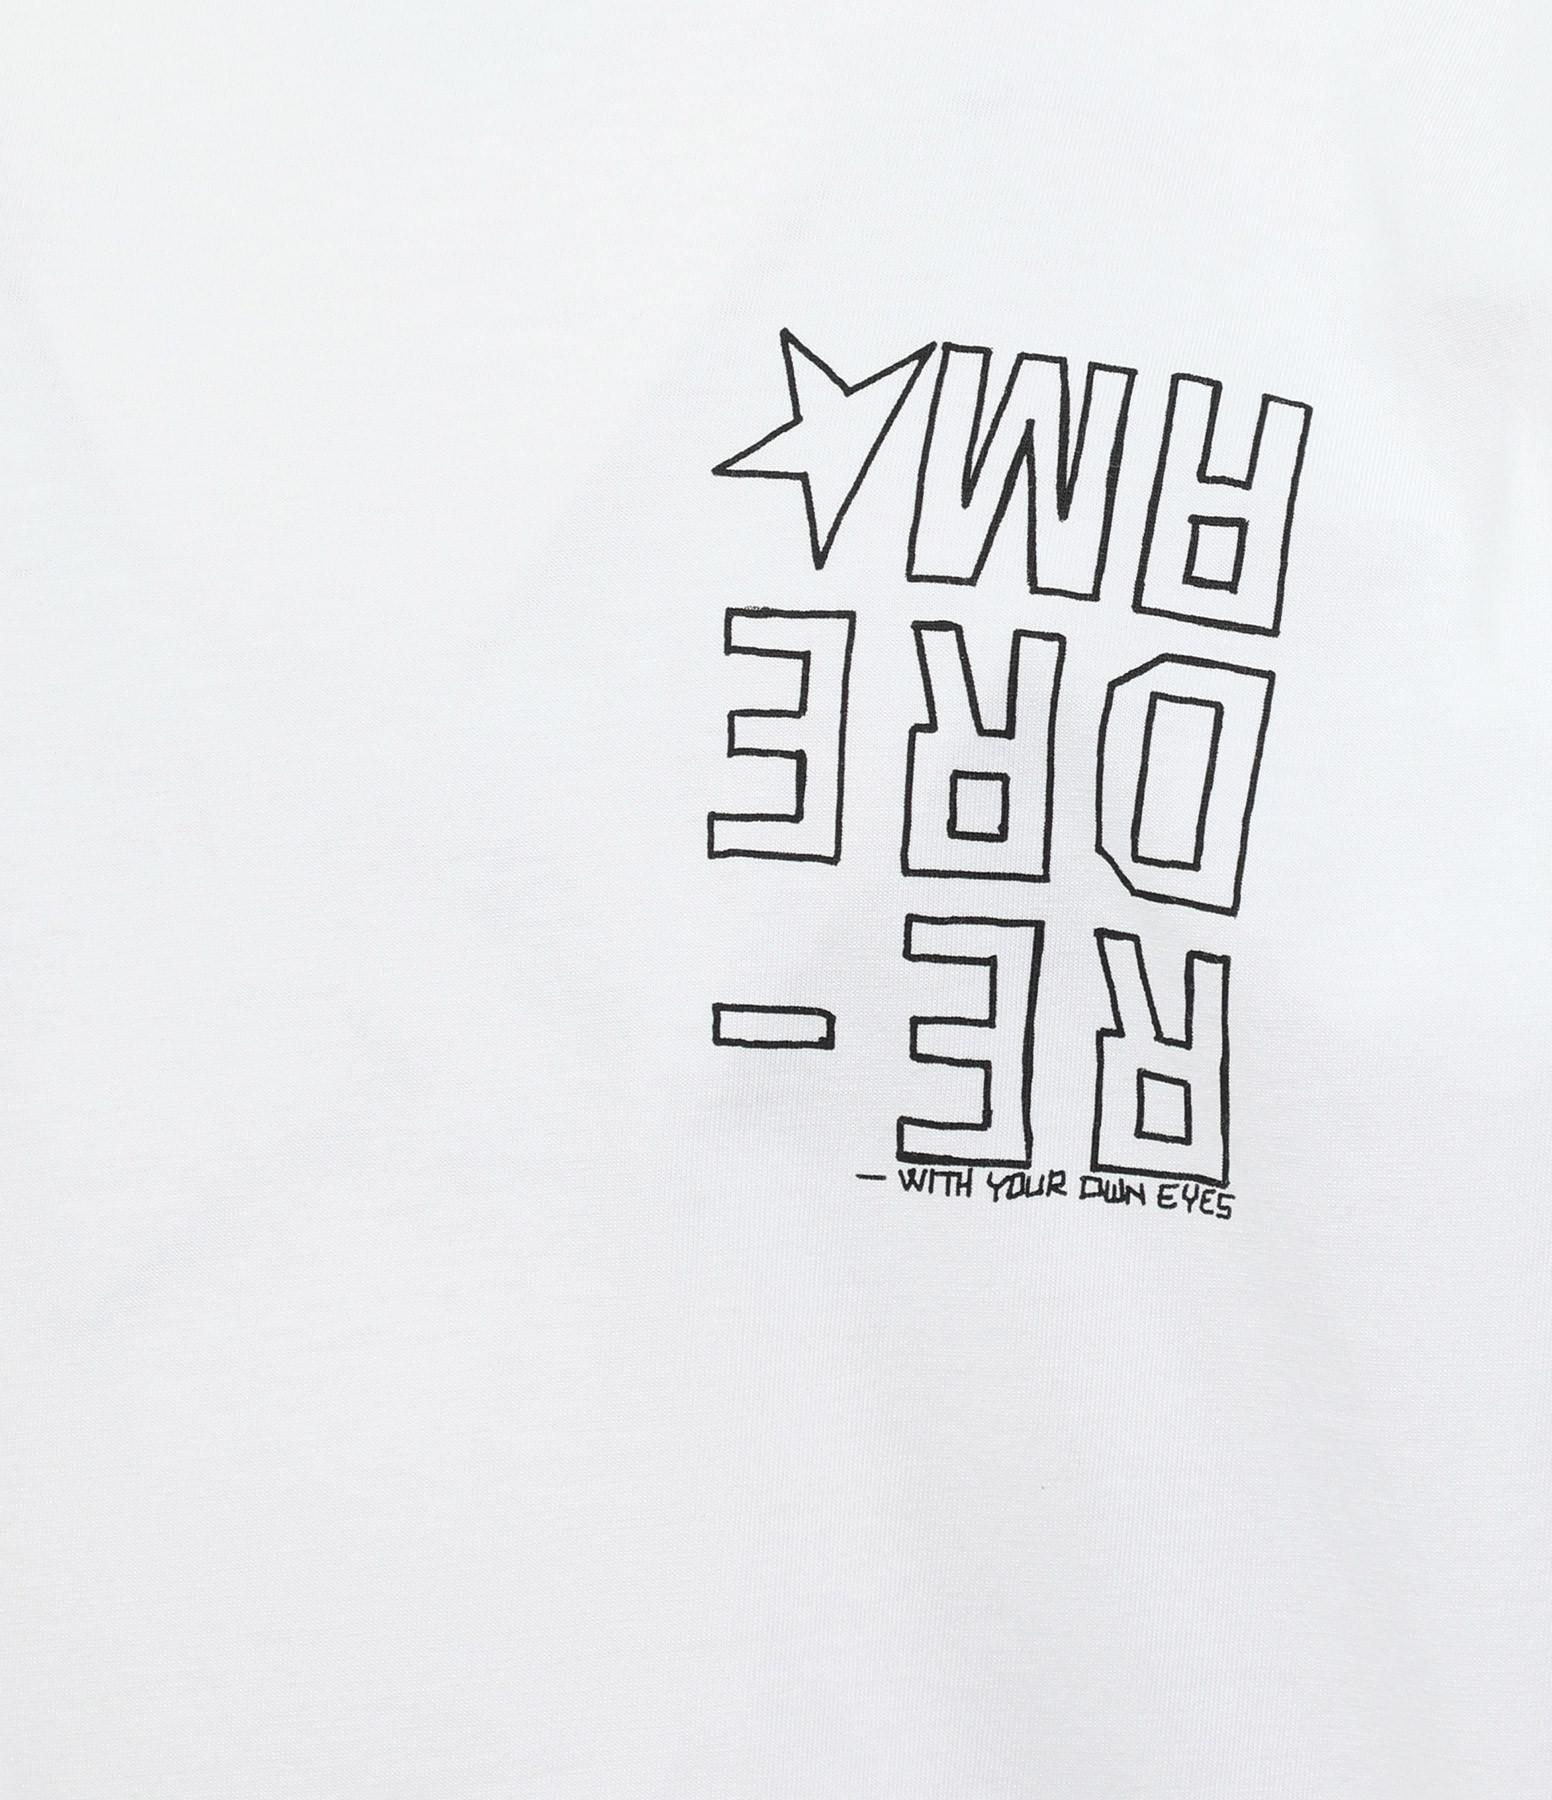 GOLDEN GOOSE - Tee-shirt Homme Artu Dreamer Coton Blanc Noir